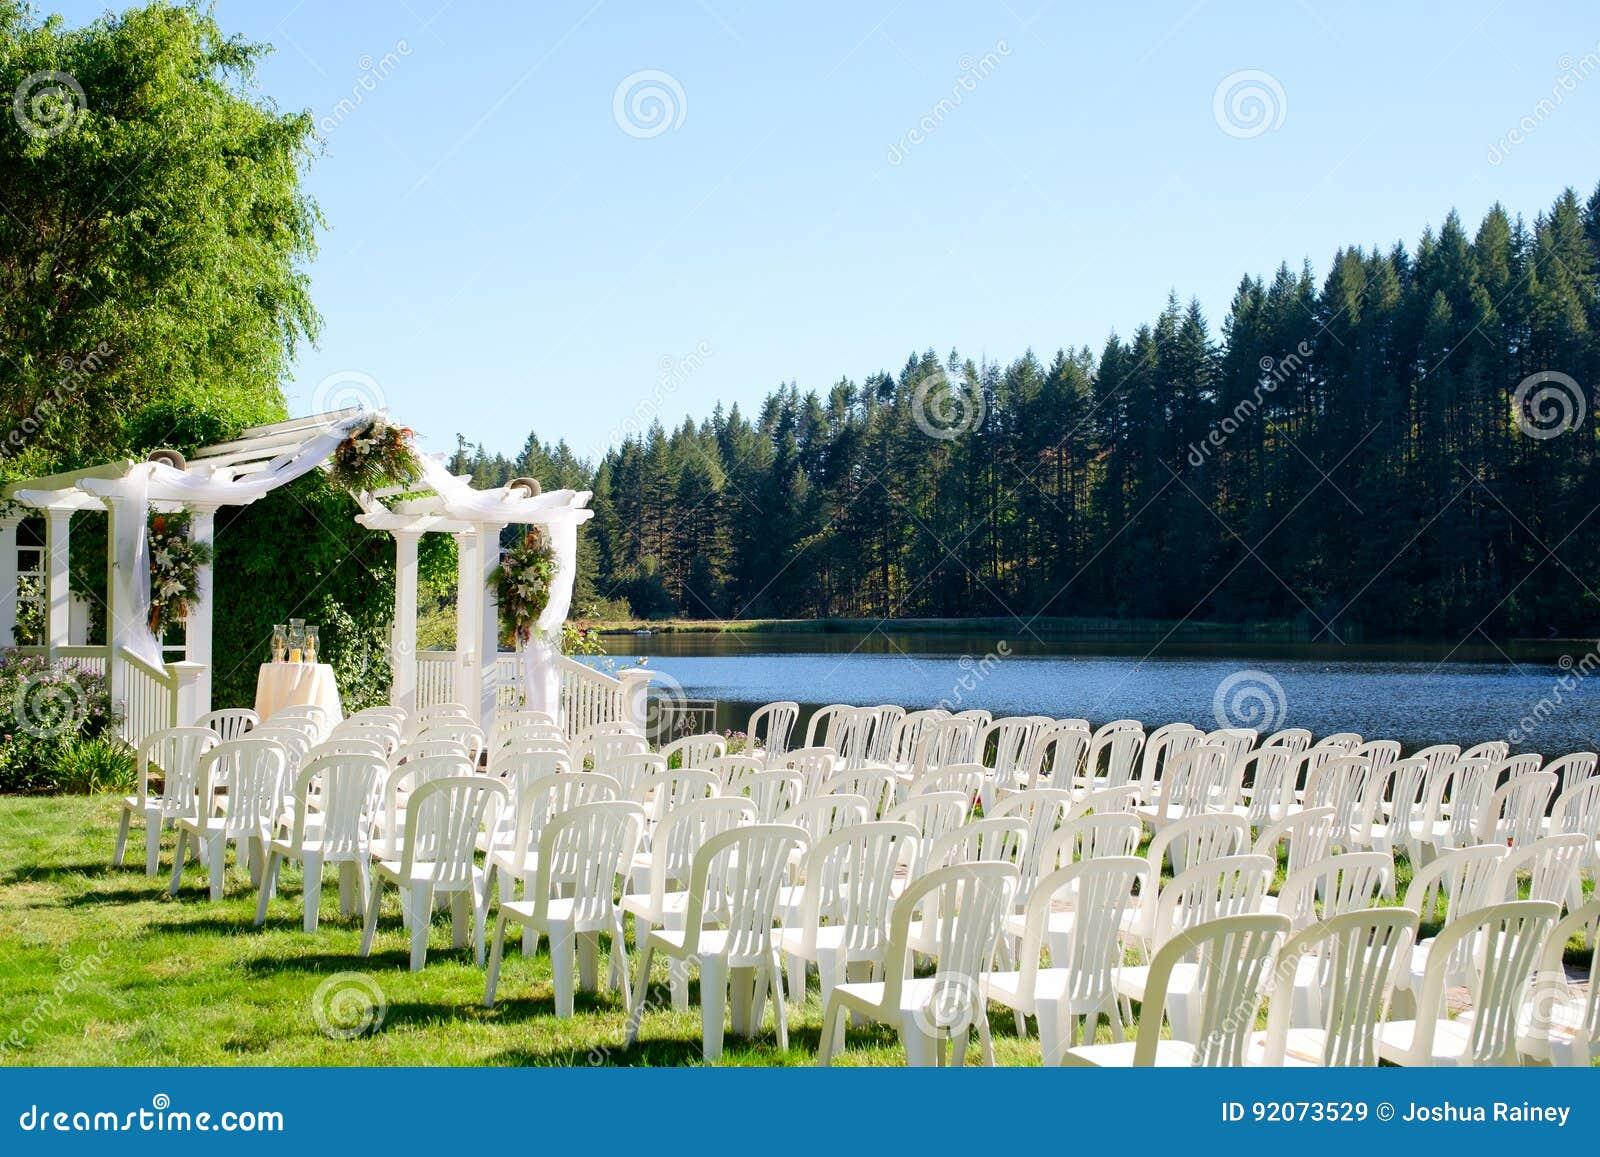 Wedding Venues In Oregon.Oregon Wedding Venue By Lake Stock Image Image Of Love